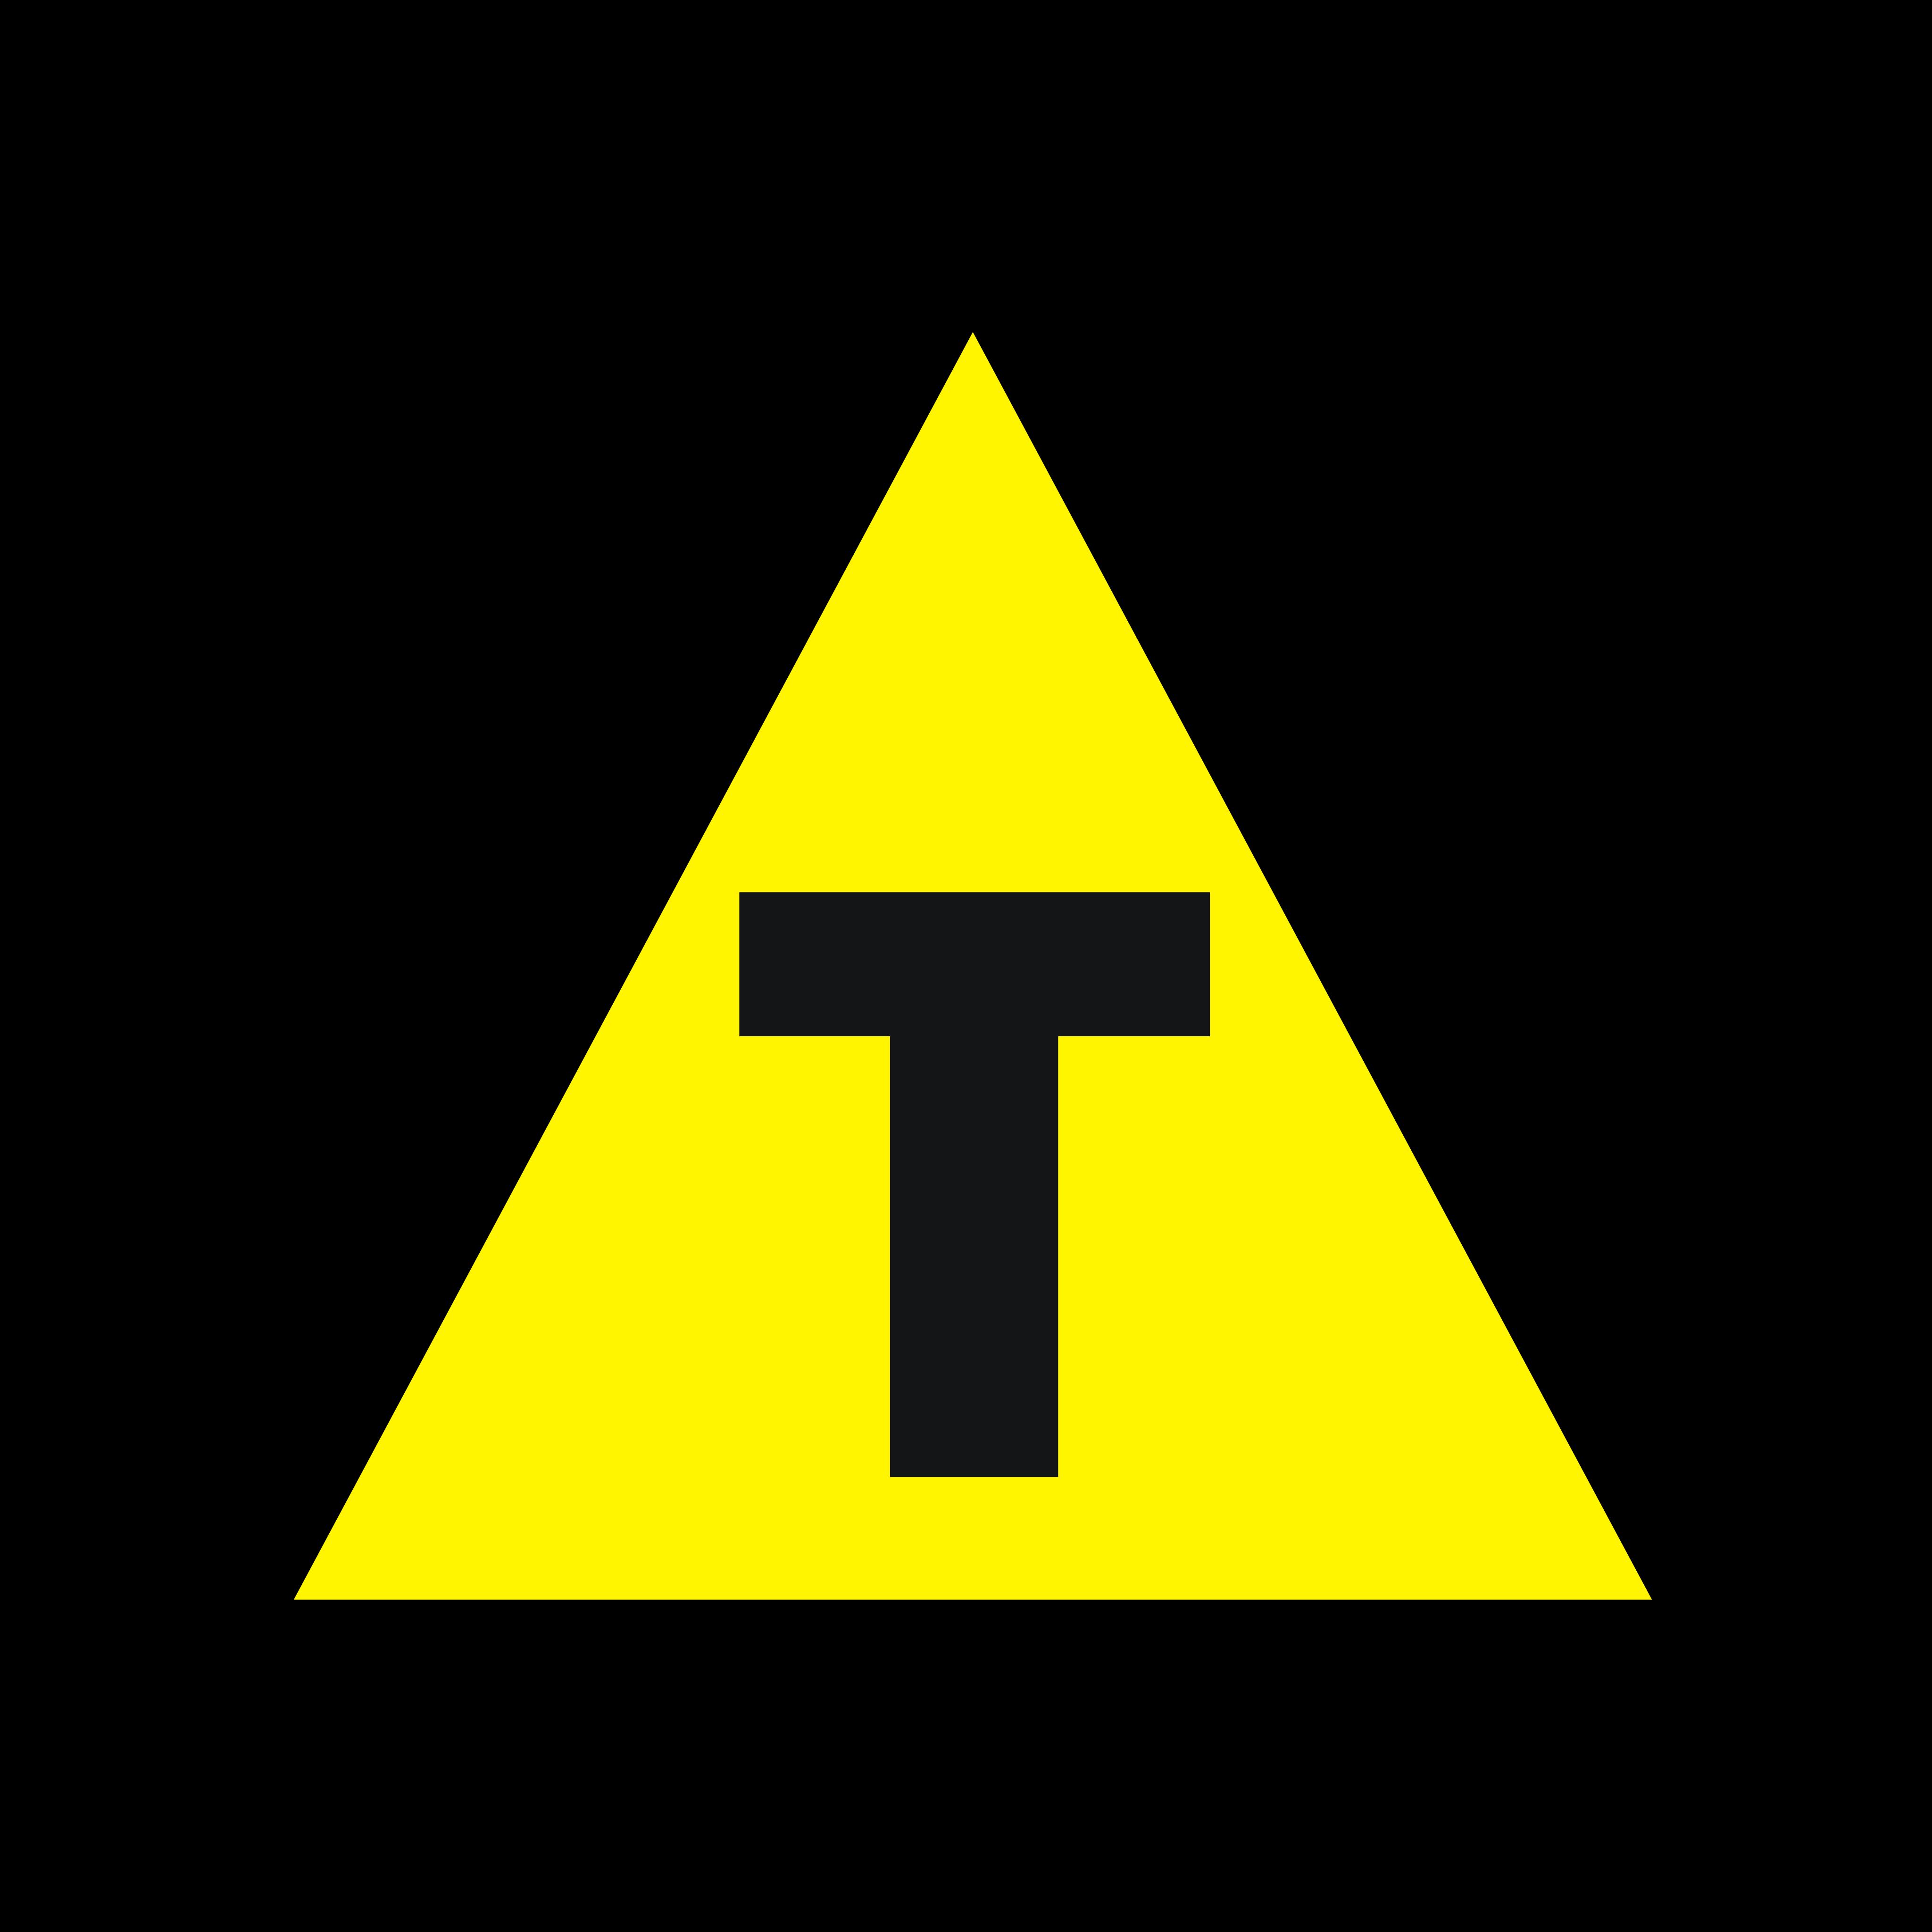 transgenico logo 0 - Transgênico Logo